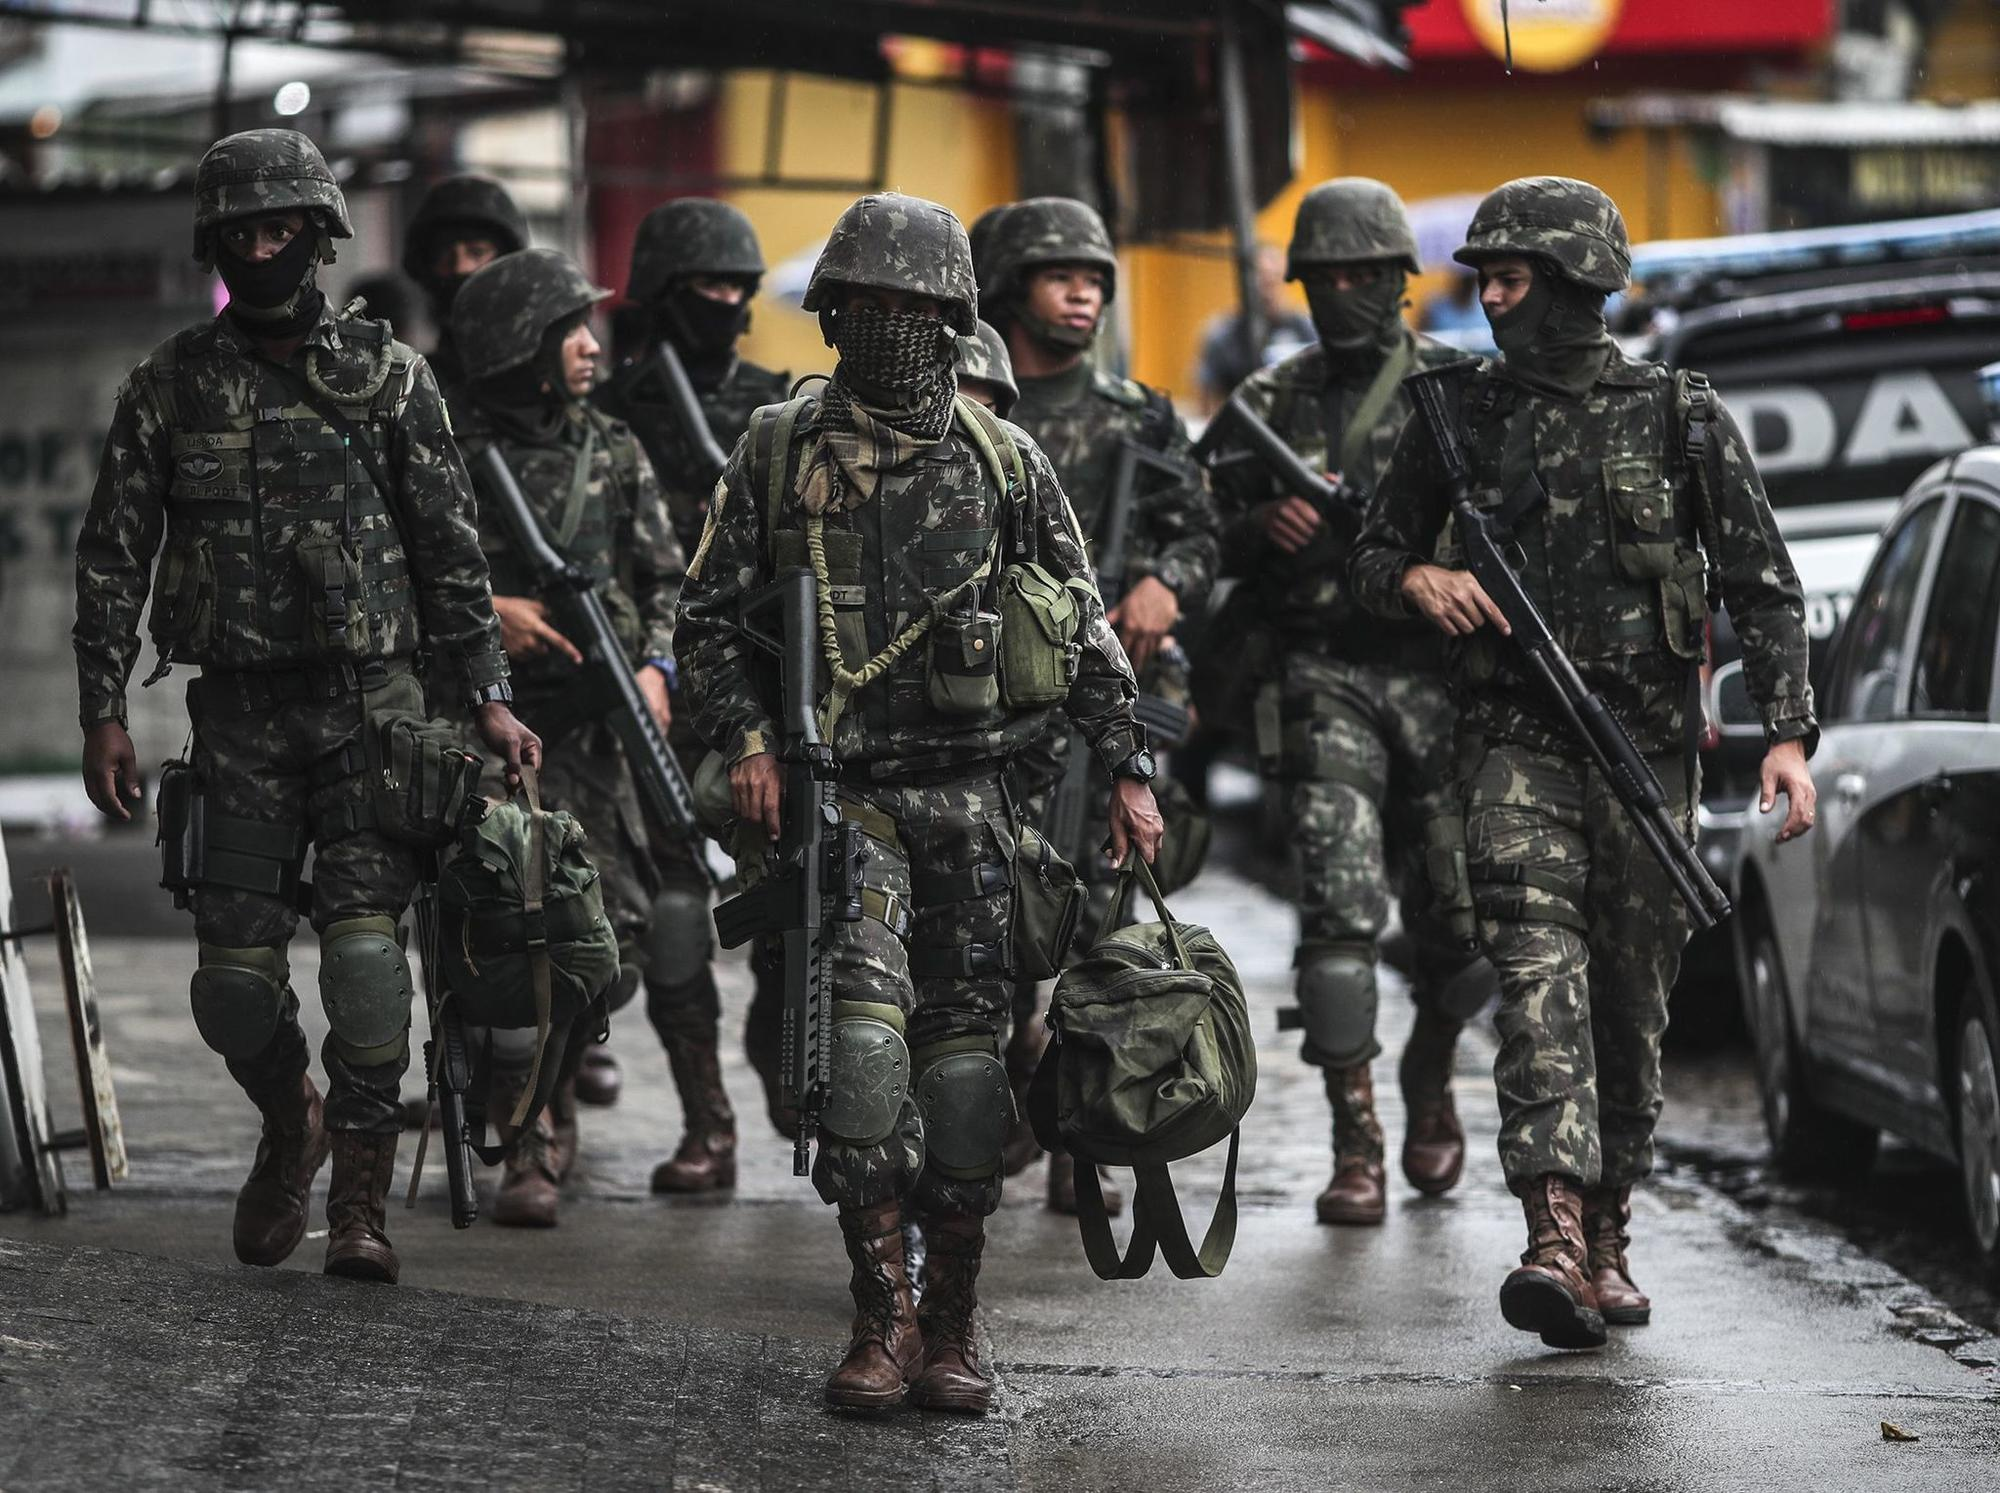 Military controls in Rio de Janeiro against organized crime, Brazil - 23 Feb 2018